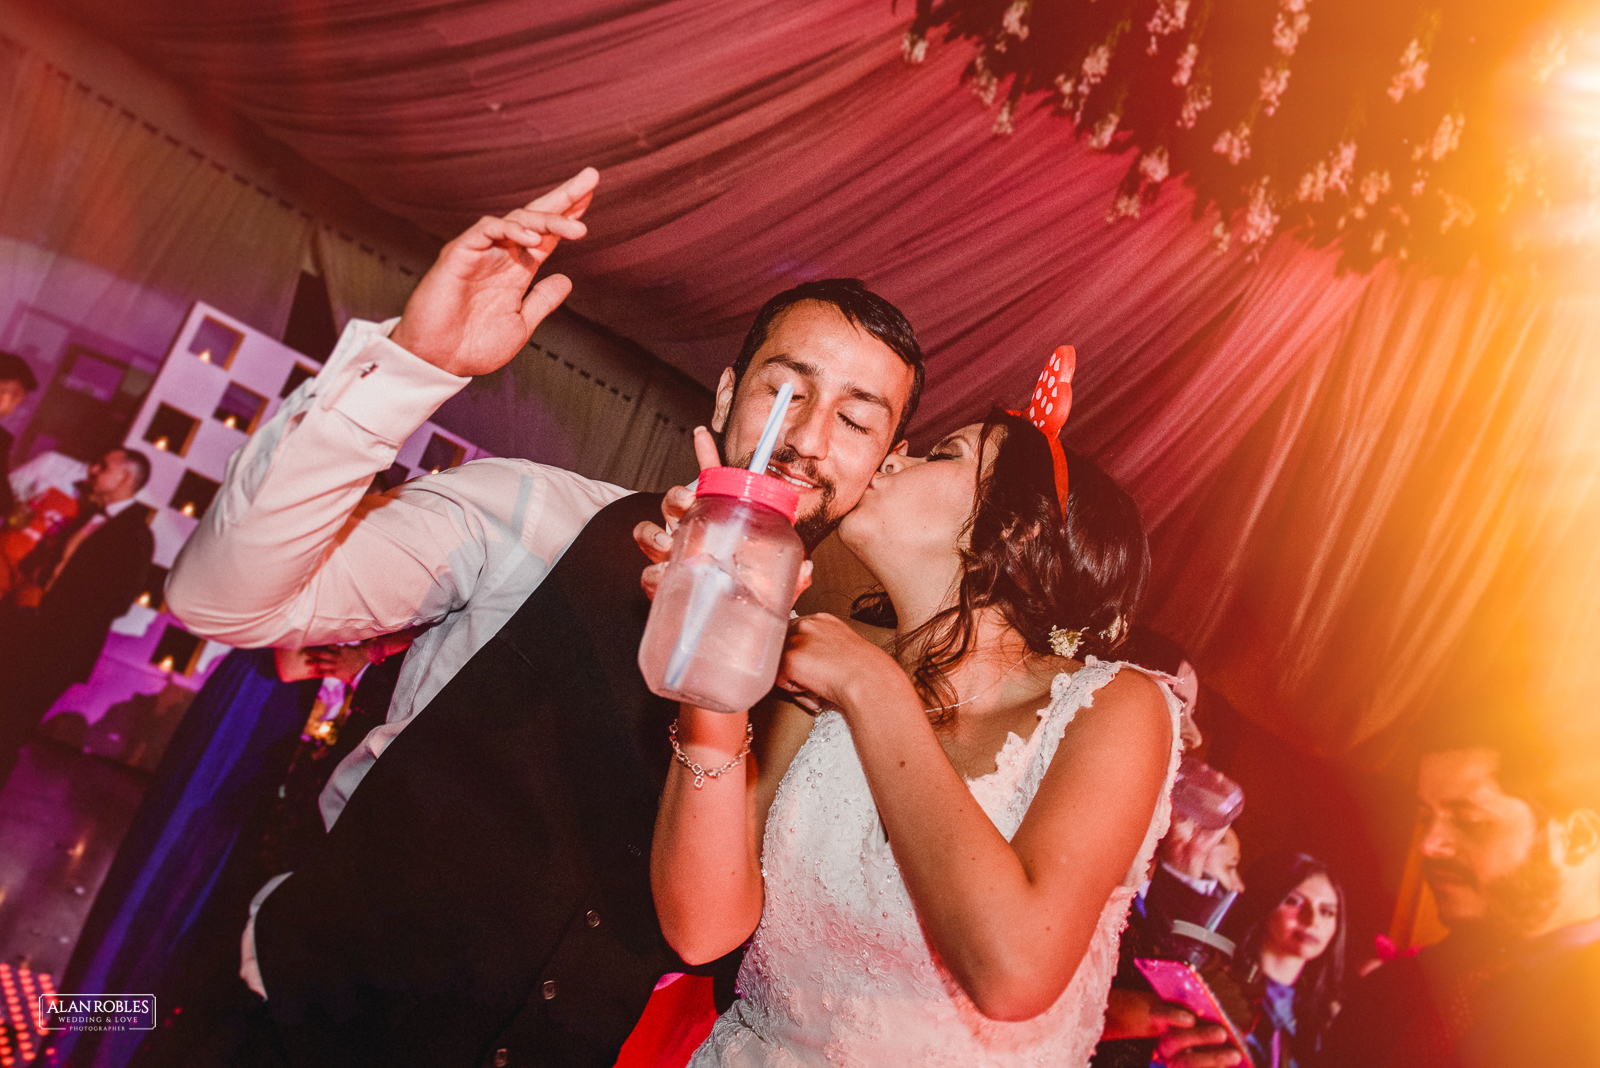 Fotografo de bodas Alan Robles-Boda en Guadalajara Real San Javier-69